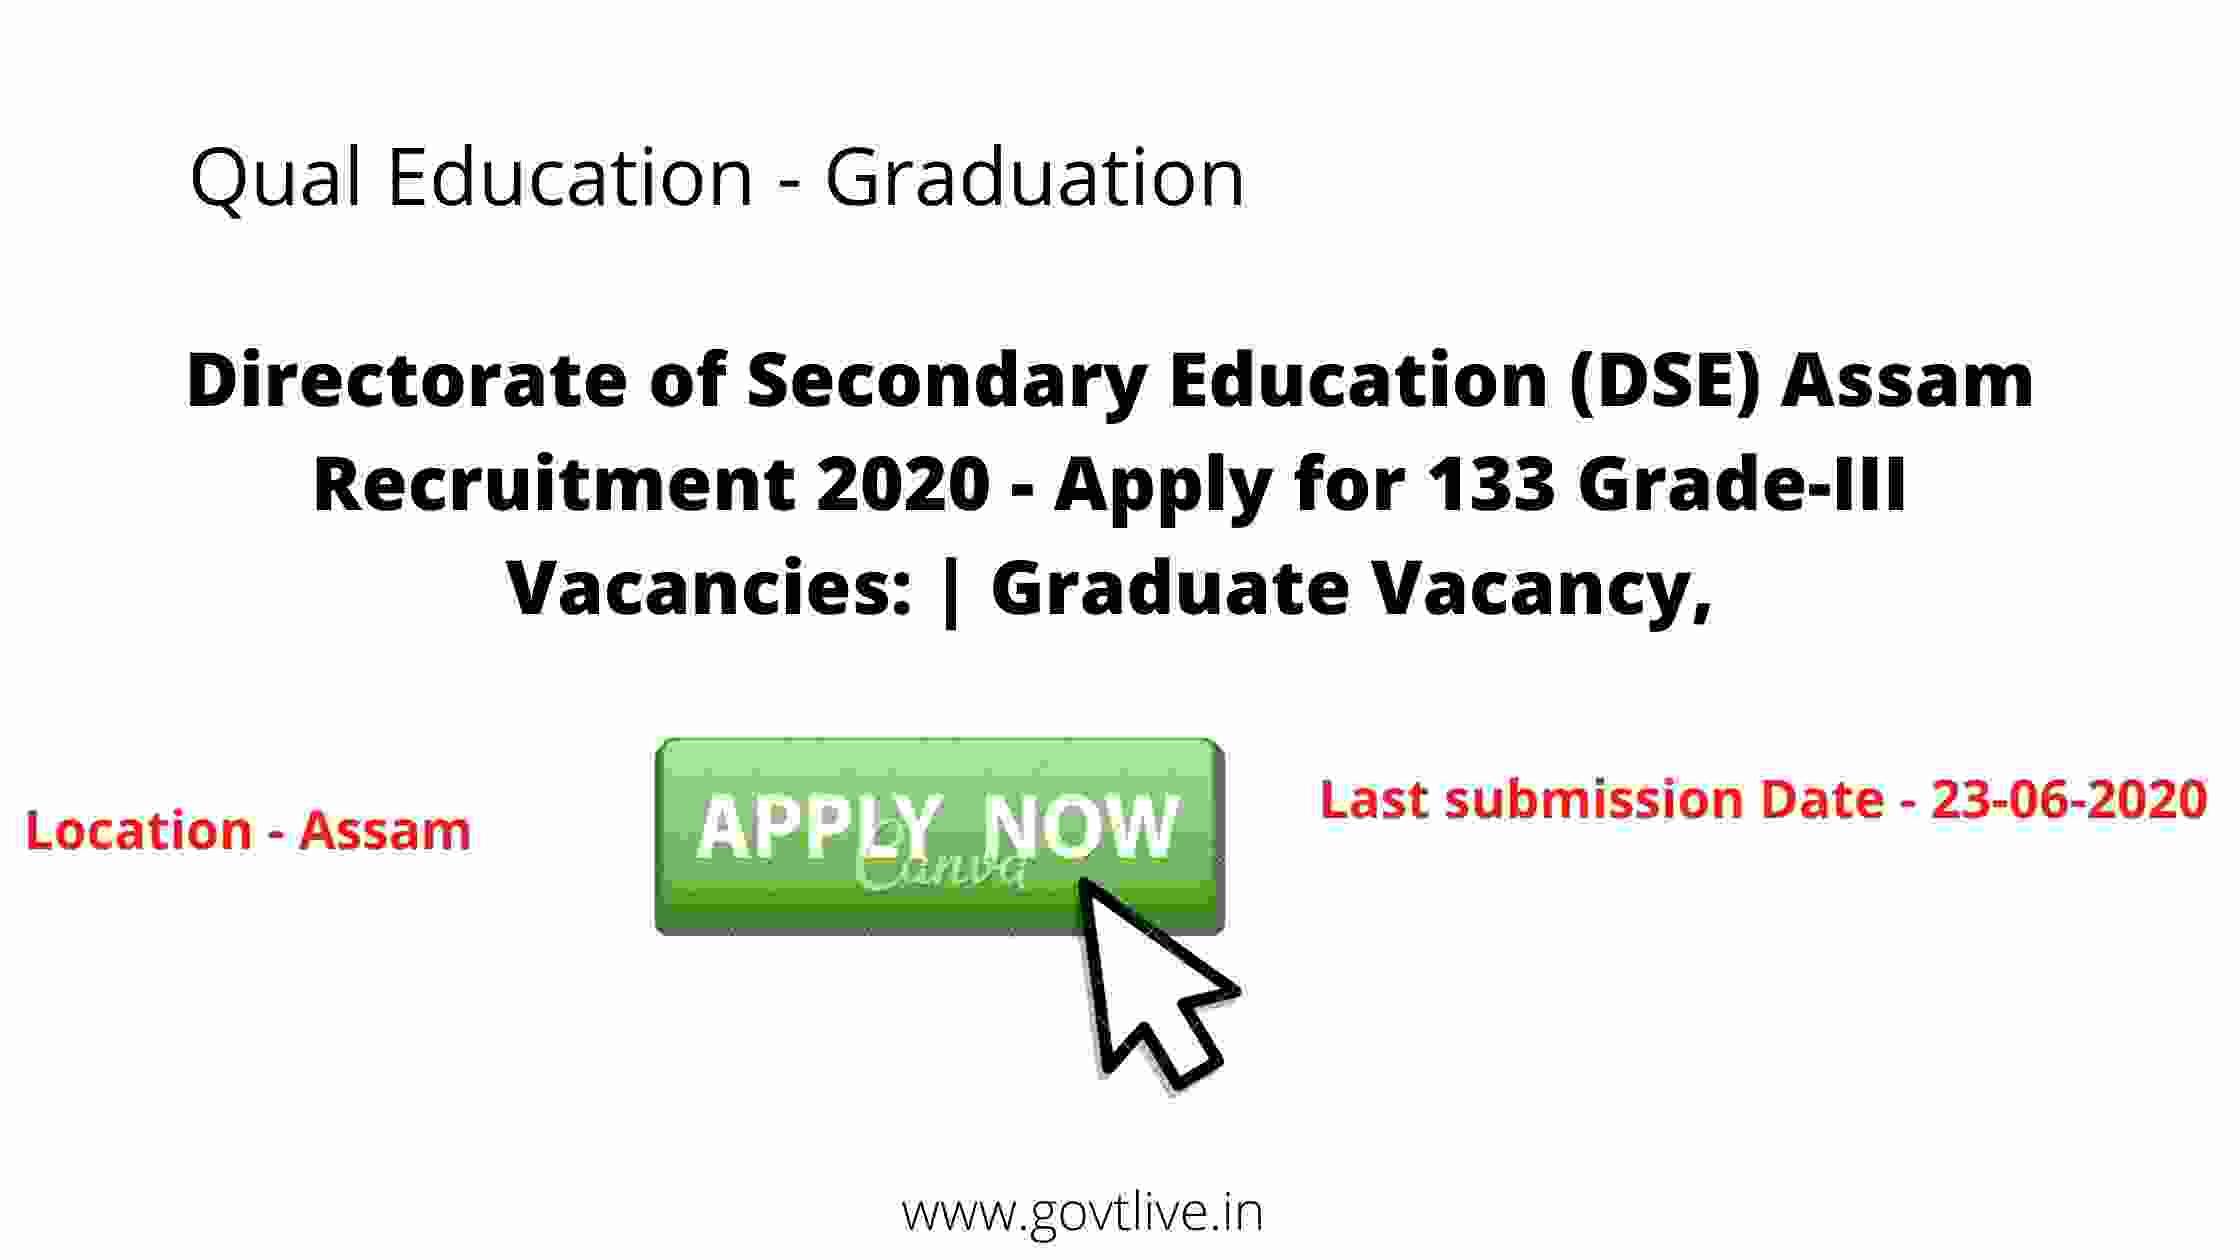 Directorate of Secondary Education (DSE) Assam Recruitment 2020 - Apply for 133 Grade-III Vacancies: | Graduate Vacancy,